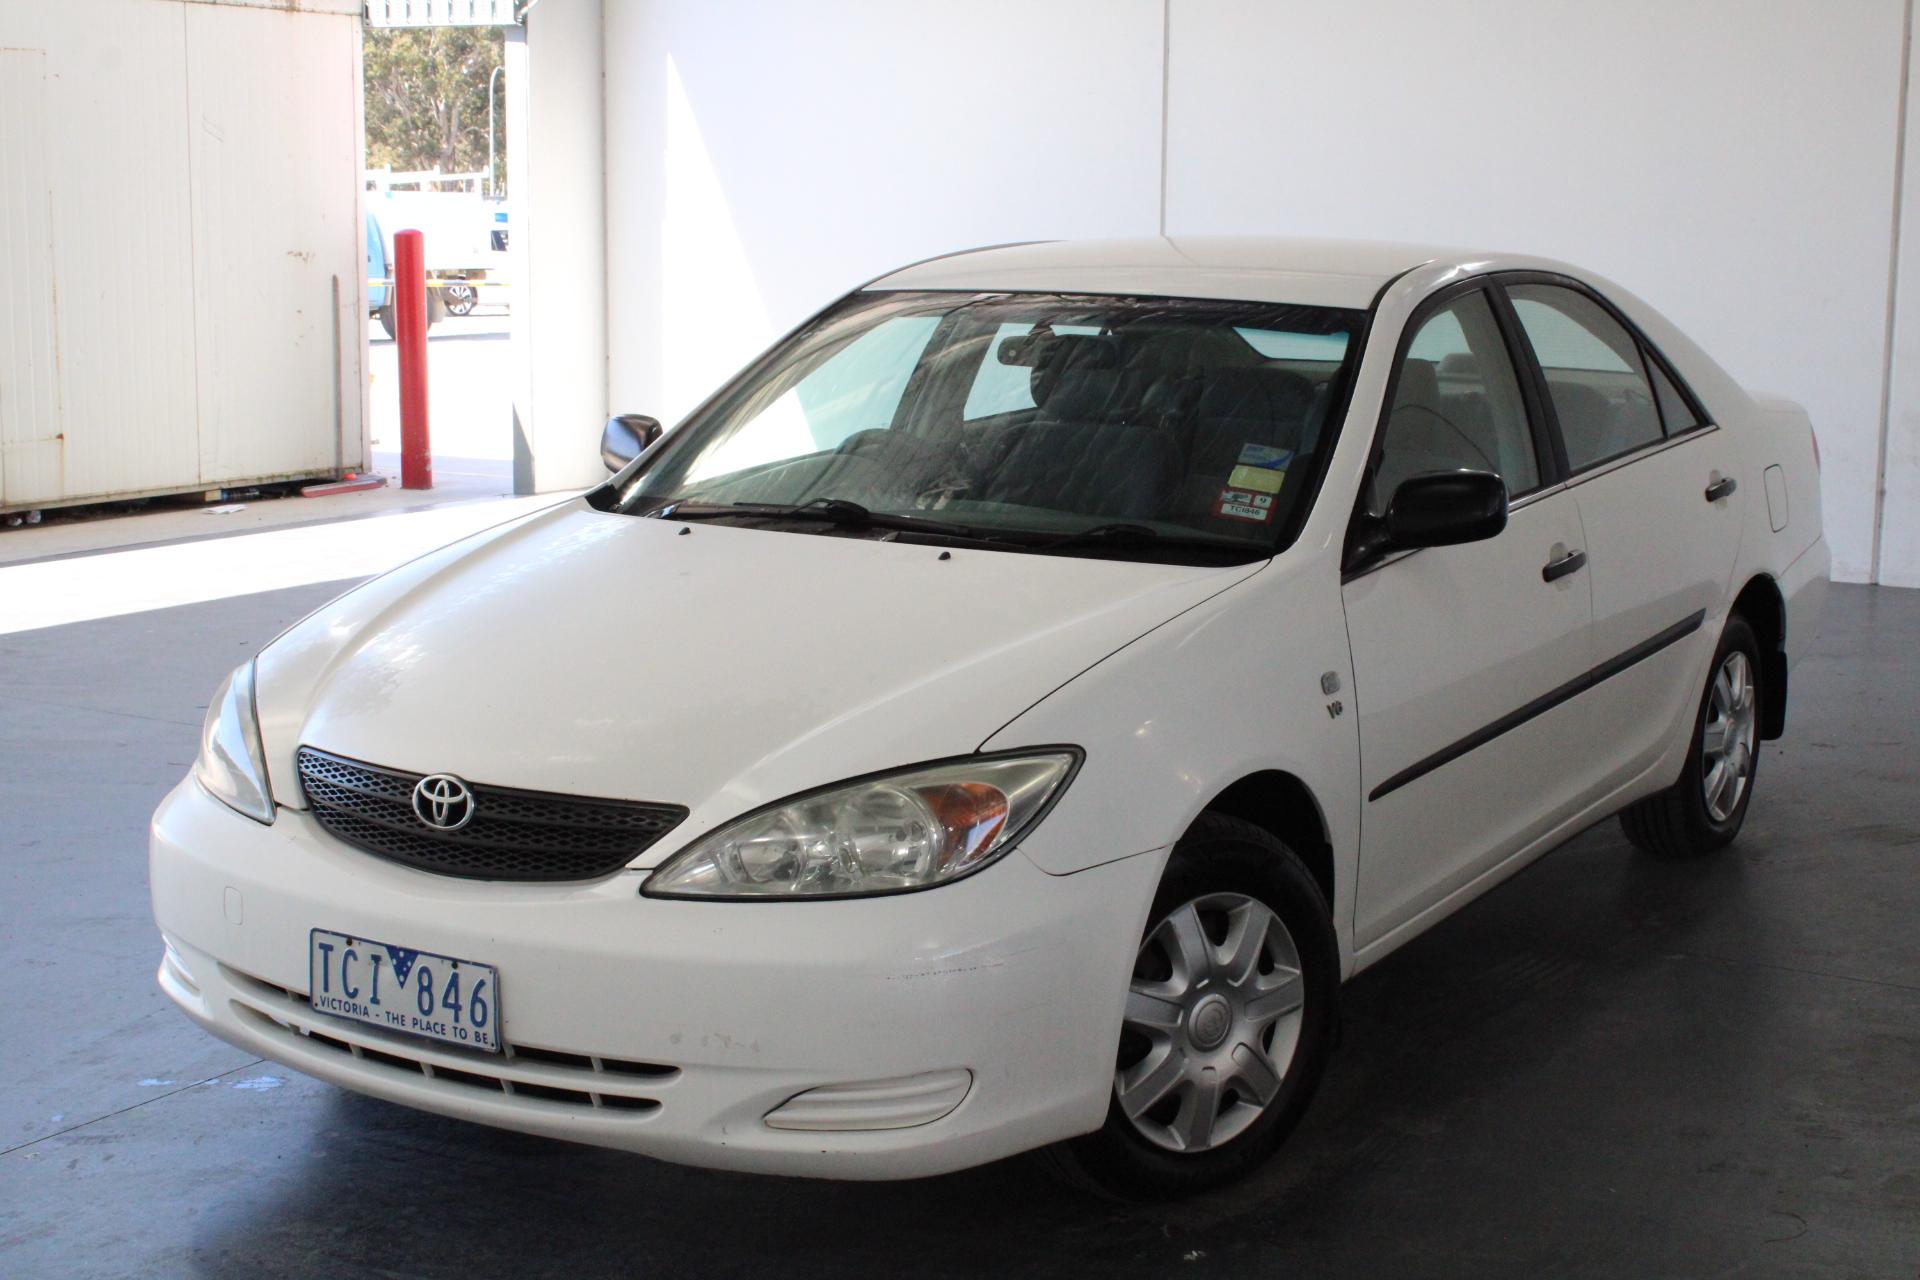 2004 Toyota Camry Altise MCV36R Automatic Sedan